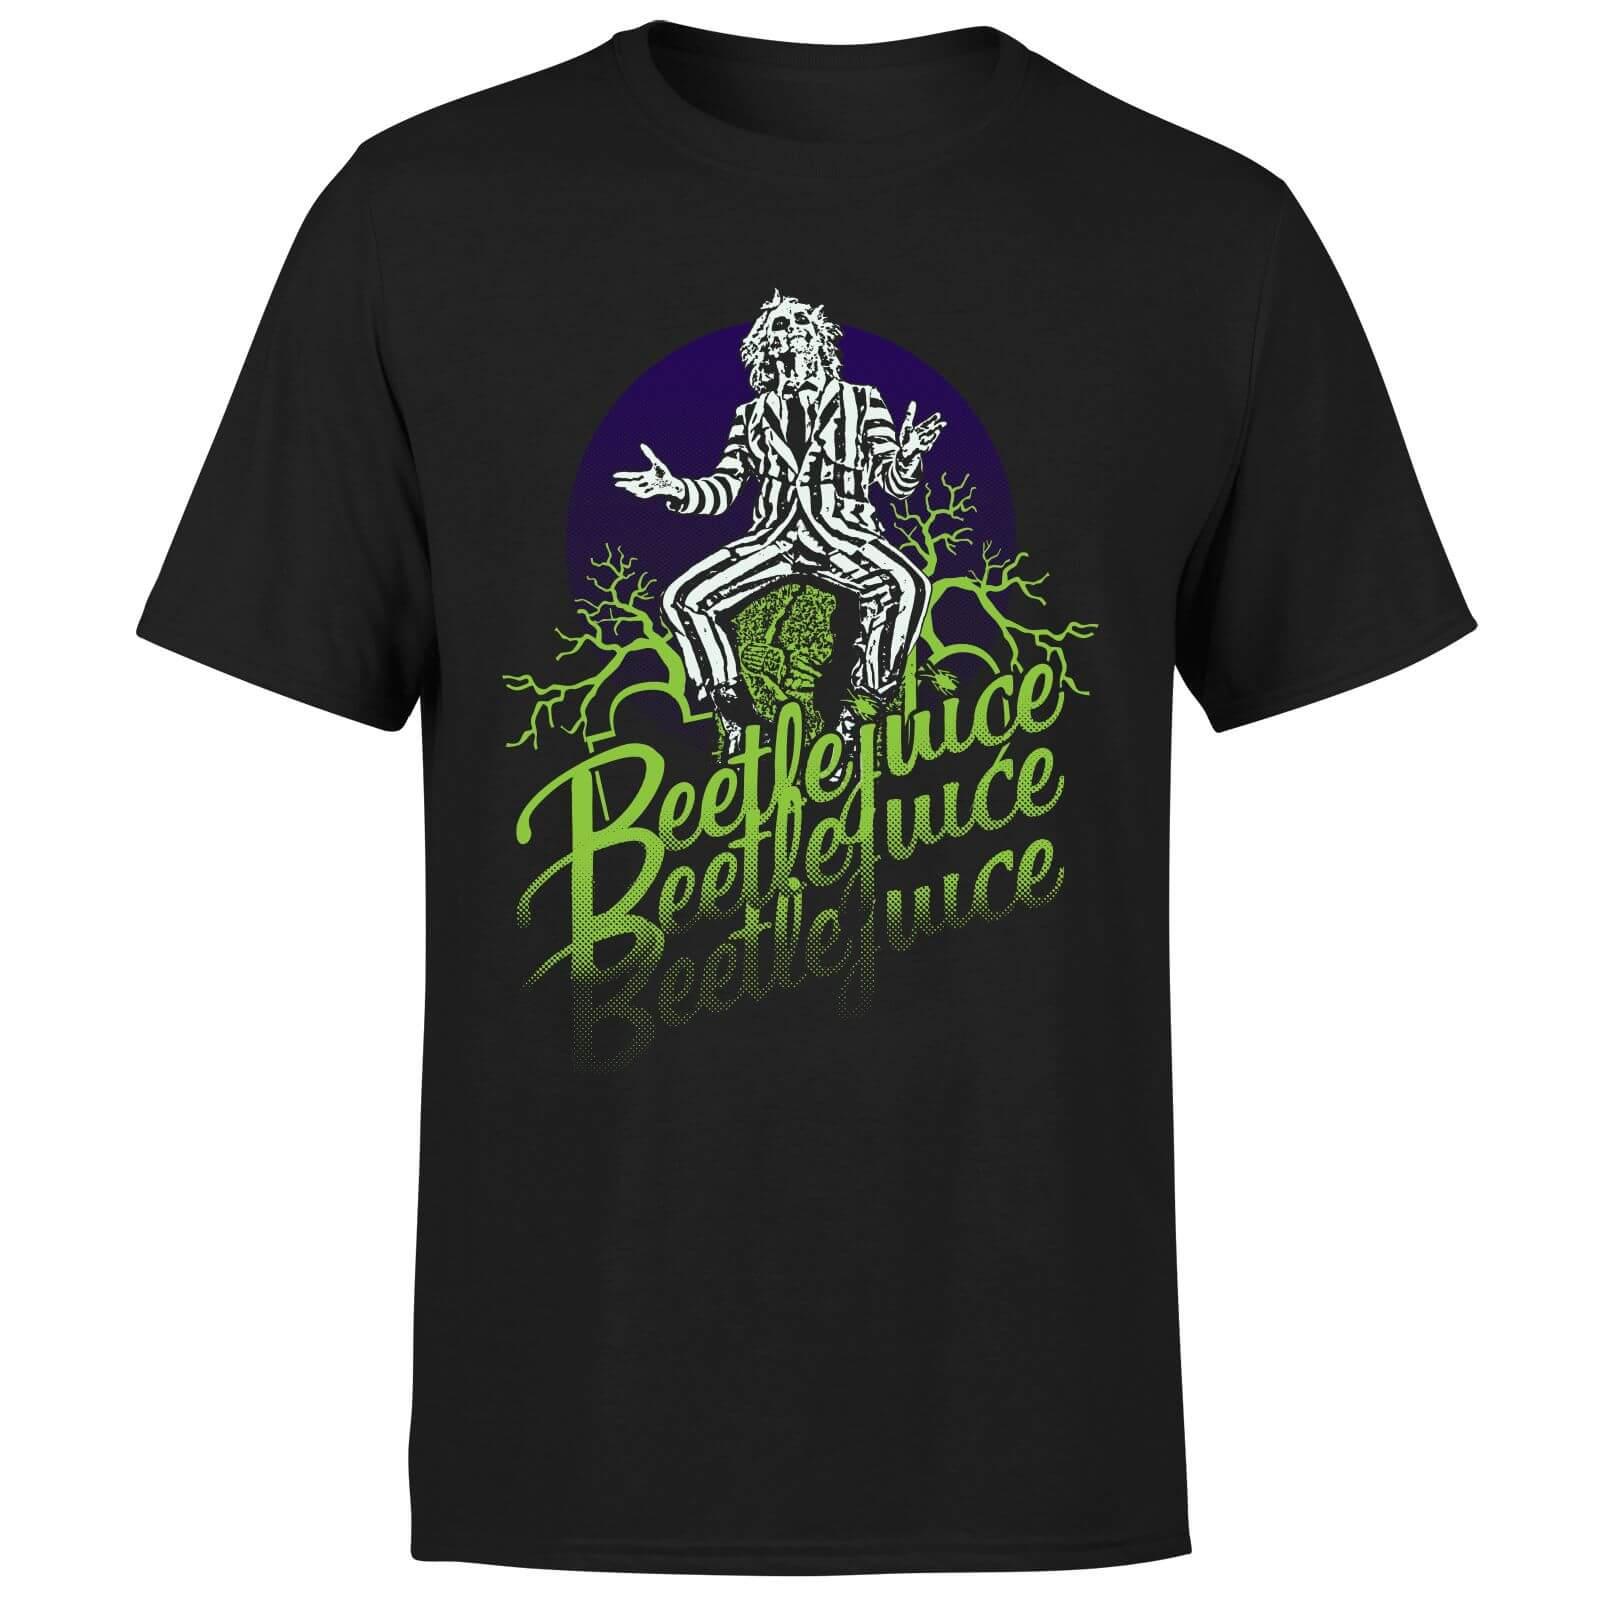 Beetlejuice T-Shirt Homme Beetlejuice Abîmé - Noir - XL - Noir